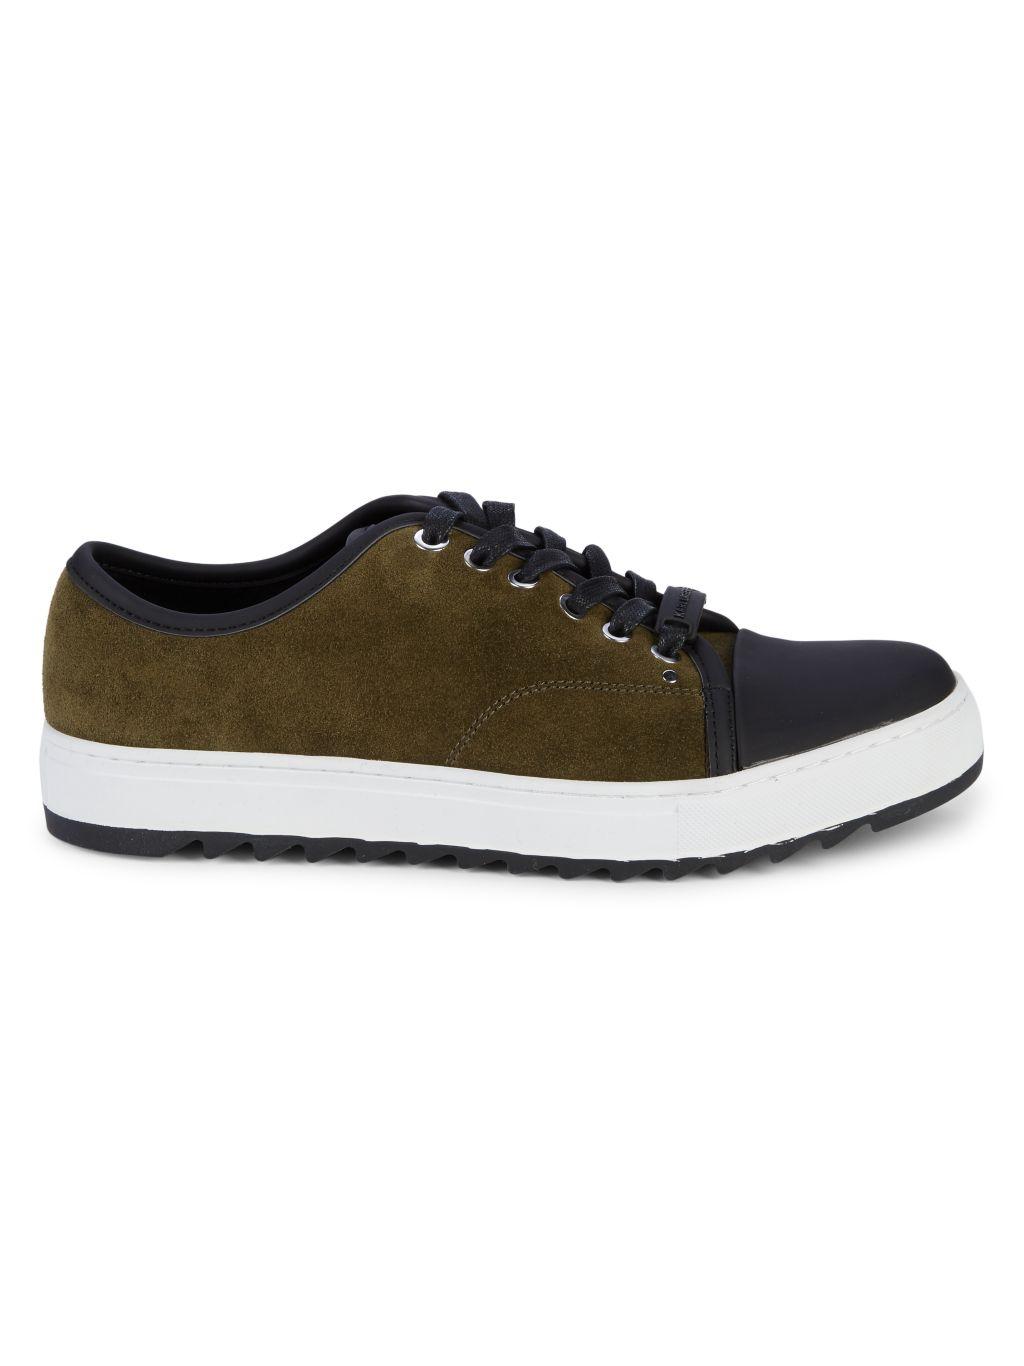 Karl Lagerfeld Paris Colorblock Sneakers